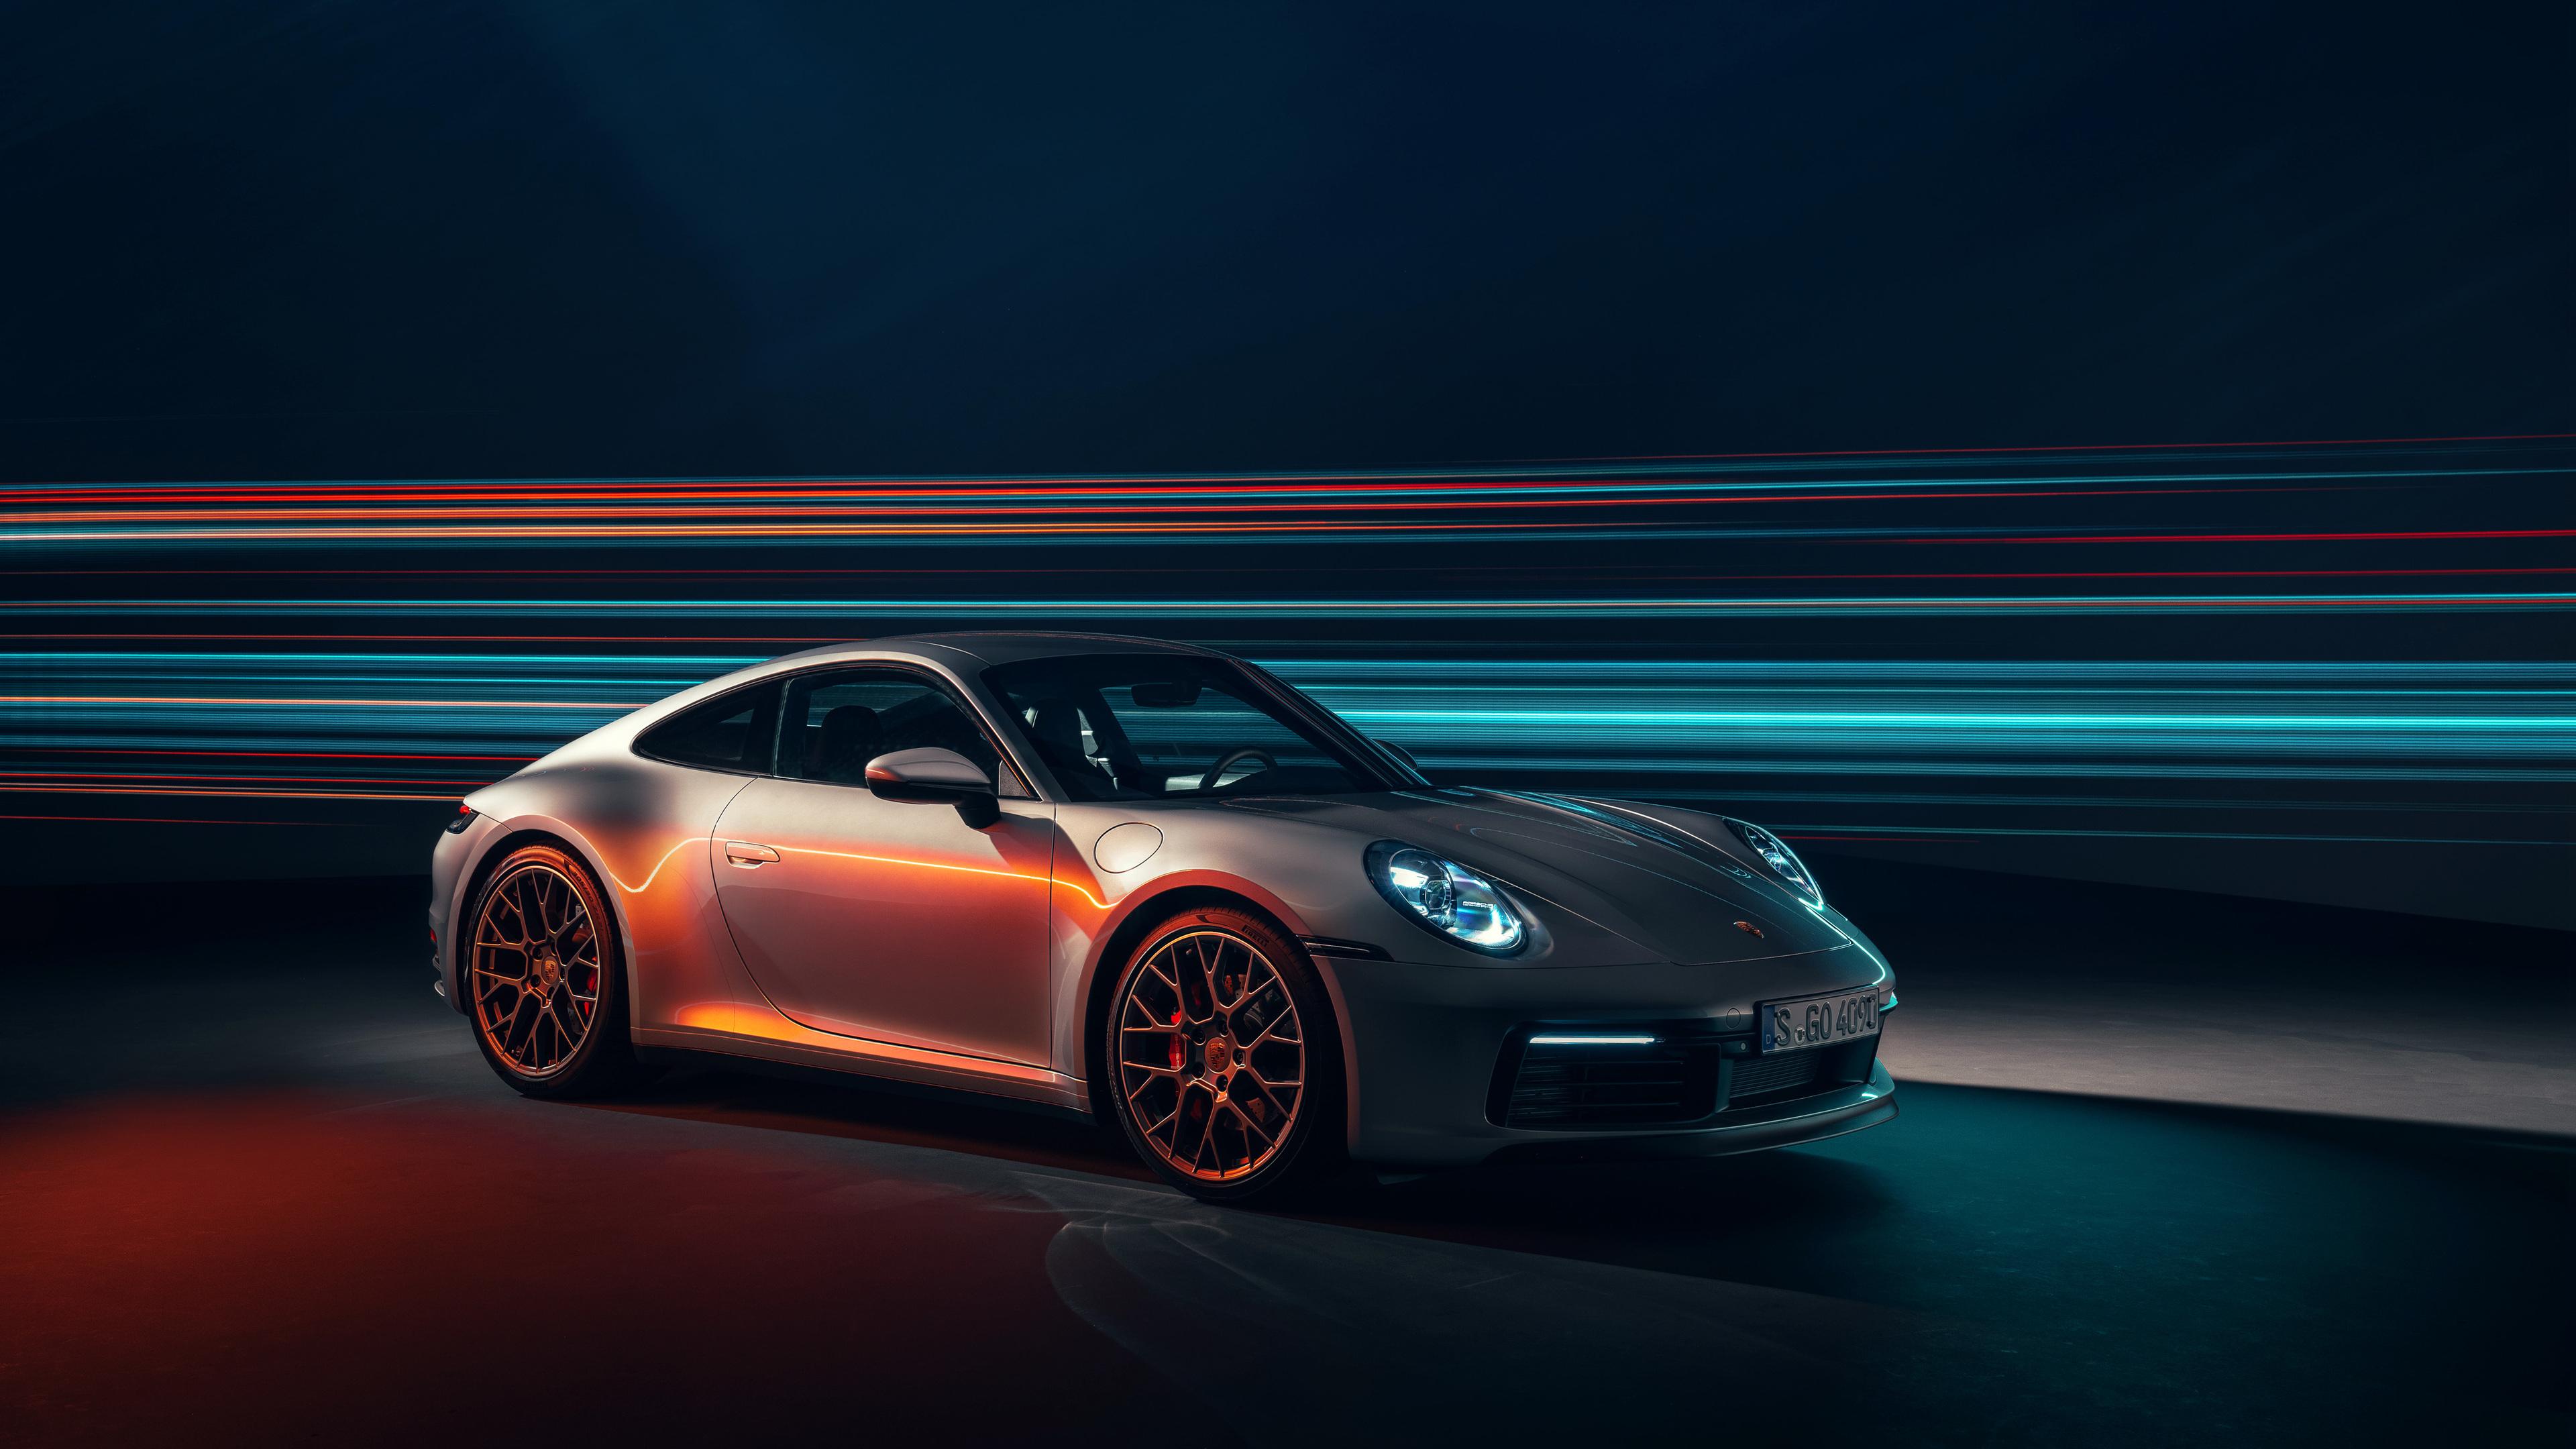 porsche 911 carrera 4s 2019 4k 1546362102 - Porsche 911 Carrera 4S 2019 4k - porsche wallpapers, porsche carrera wallpapers, hd-wallpapers, cars wallpapers, 4k-wallpapers, 2019 cars wallpapers